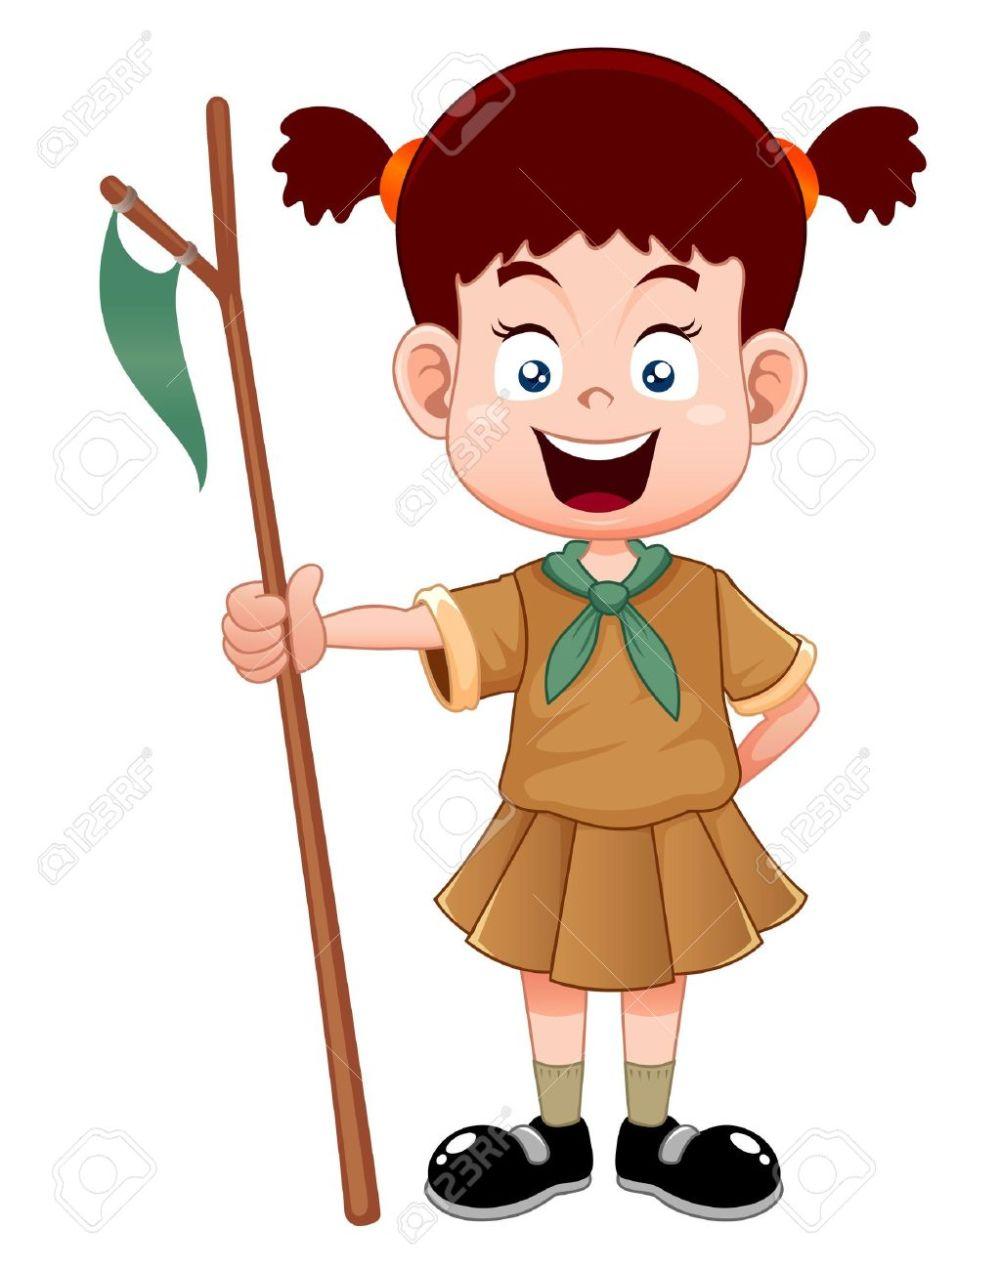 medium resolution of 1023x1300 girl scout uniform clipart